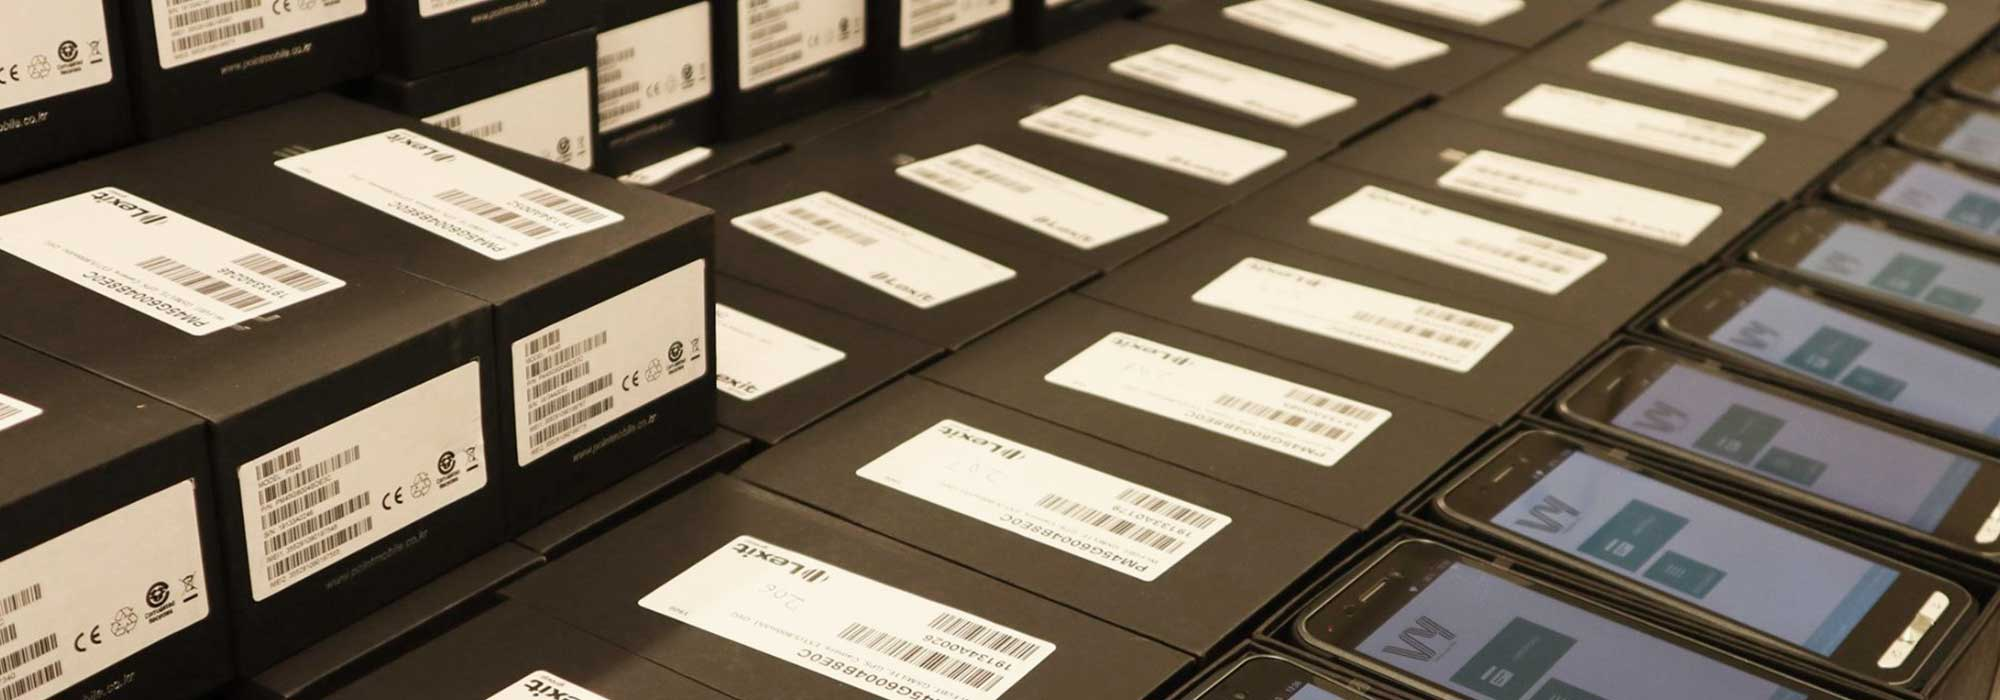 En rekke med håndterminaler og tilhørende emballasje